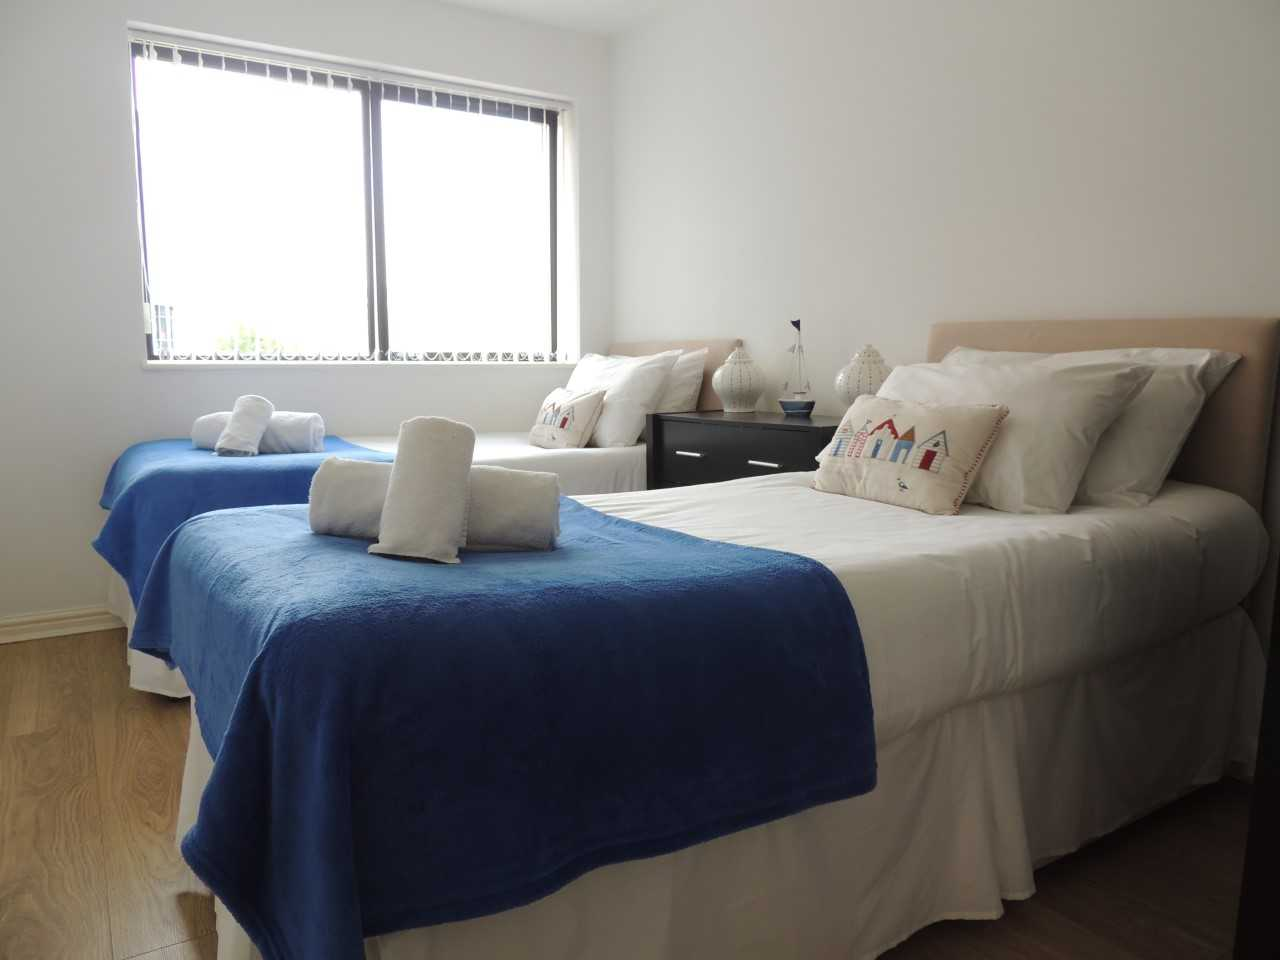 Bedroom at South Row Apartments